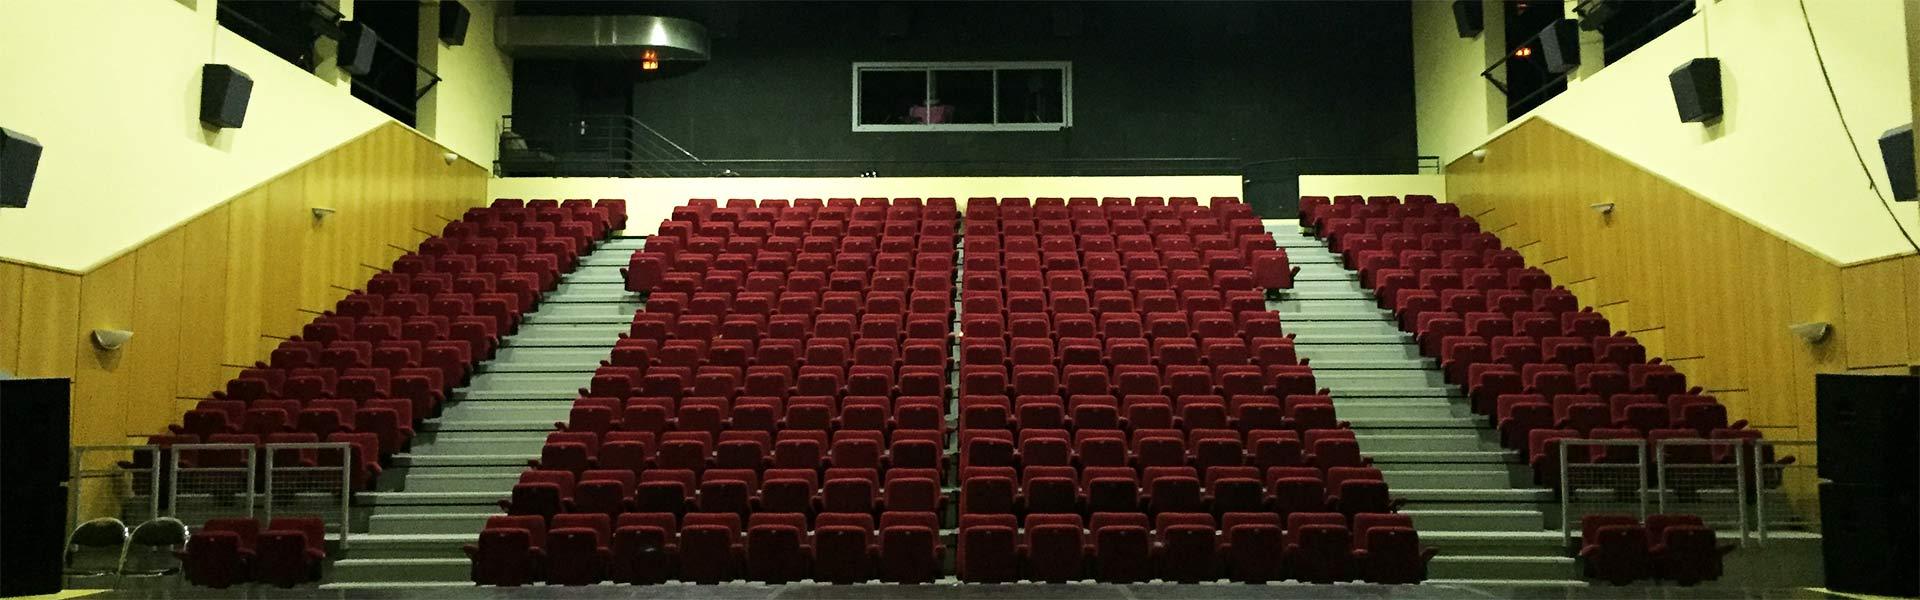 L'Artea 306 fauteuils